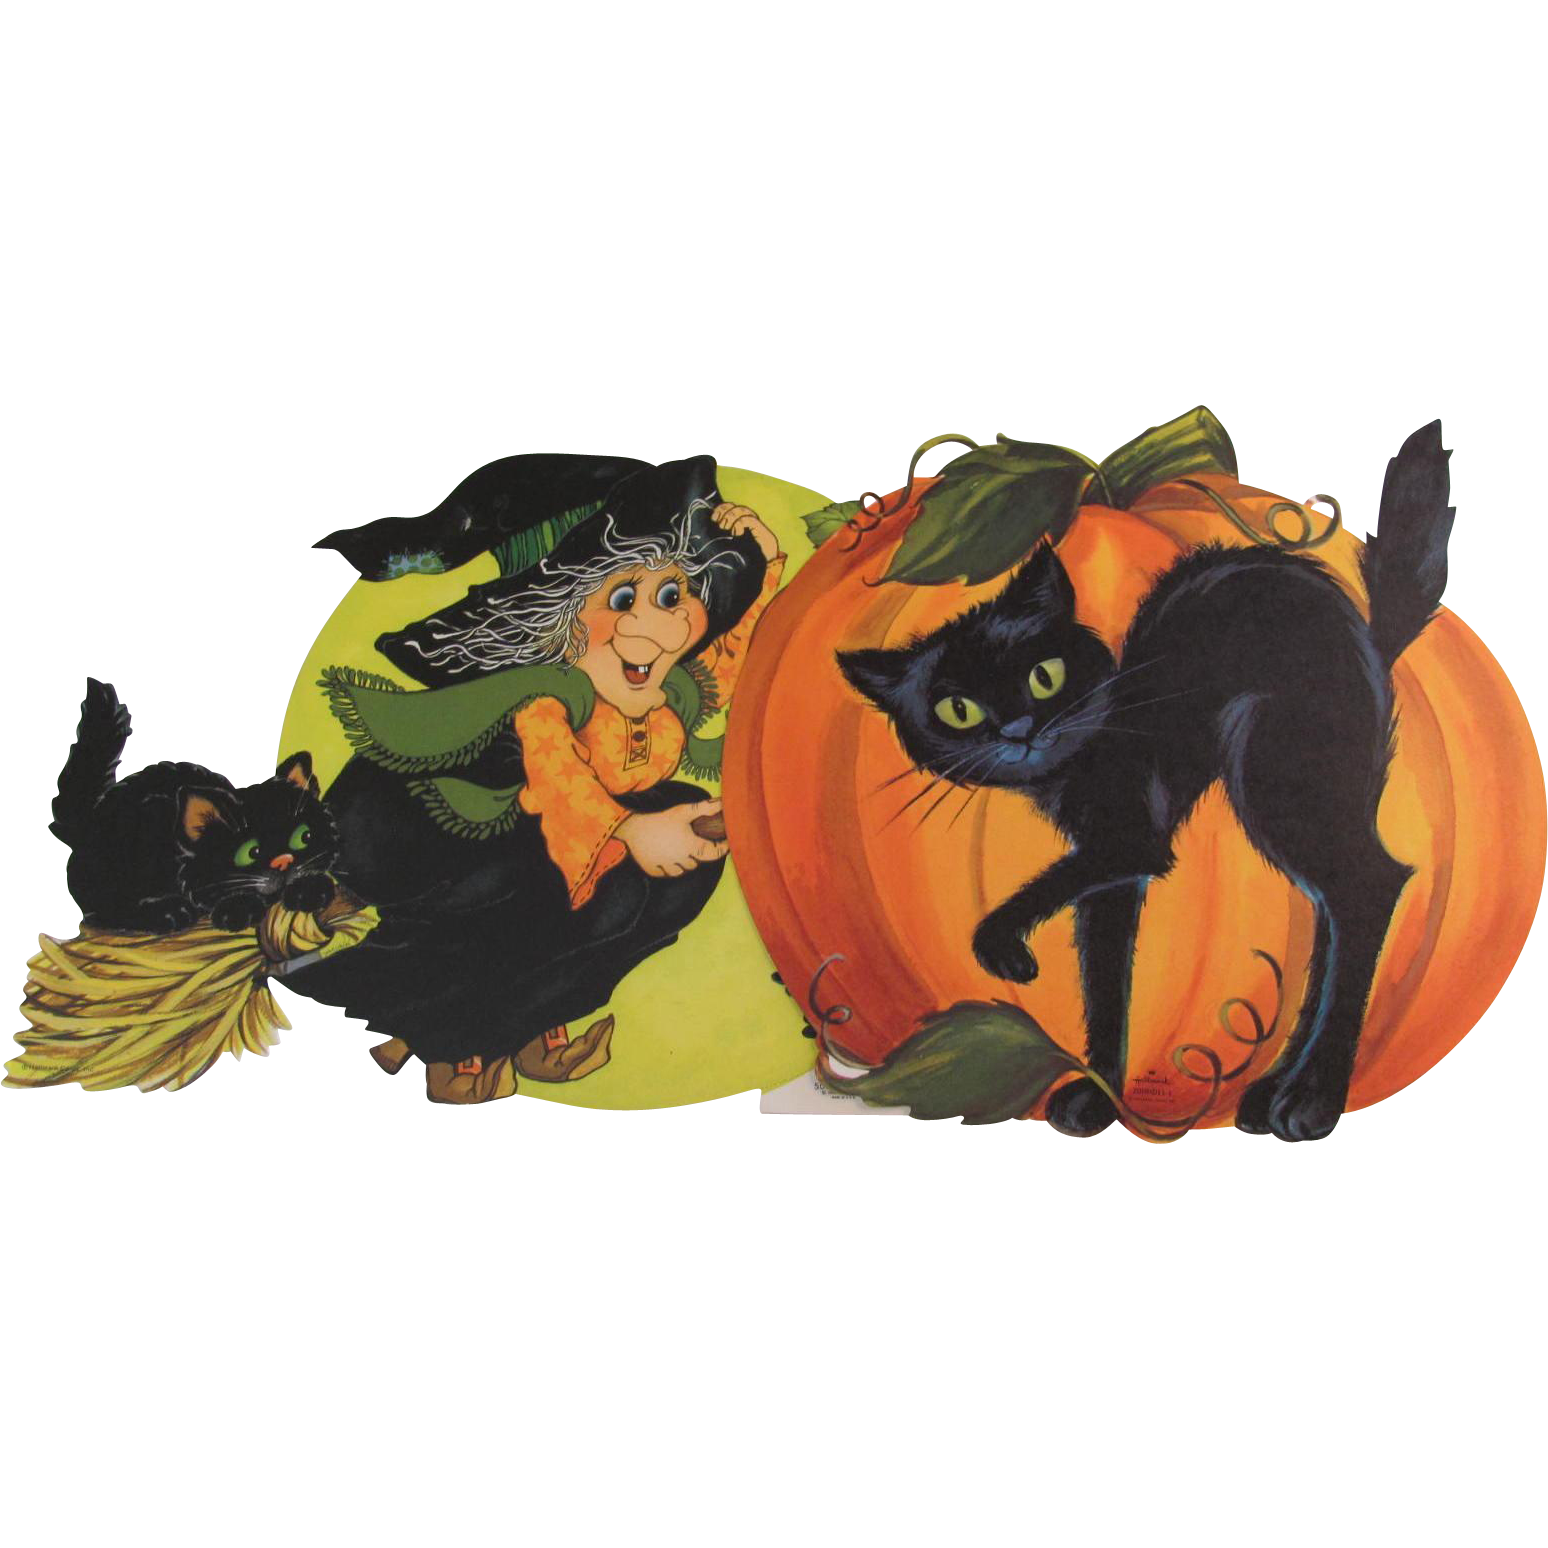 2 Halloween Hallmark Wall Decorations Witch Cat JOL